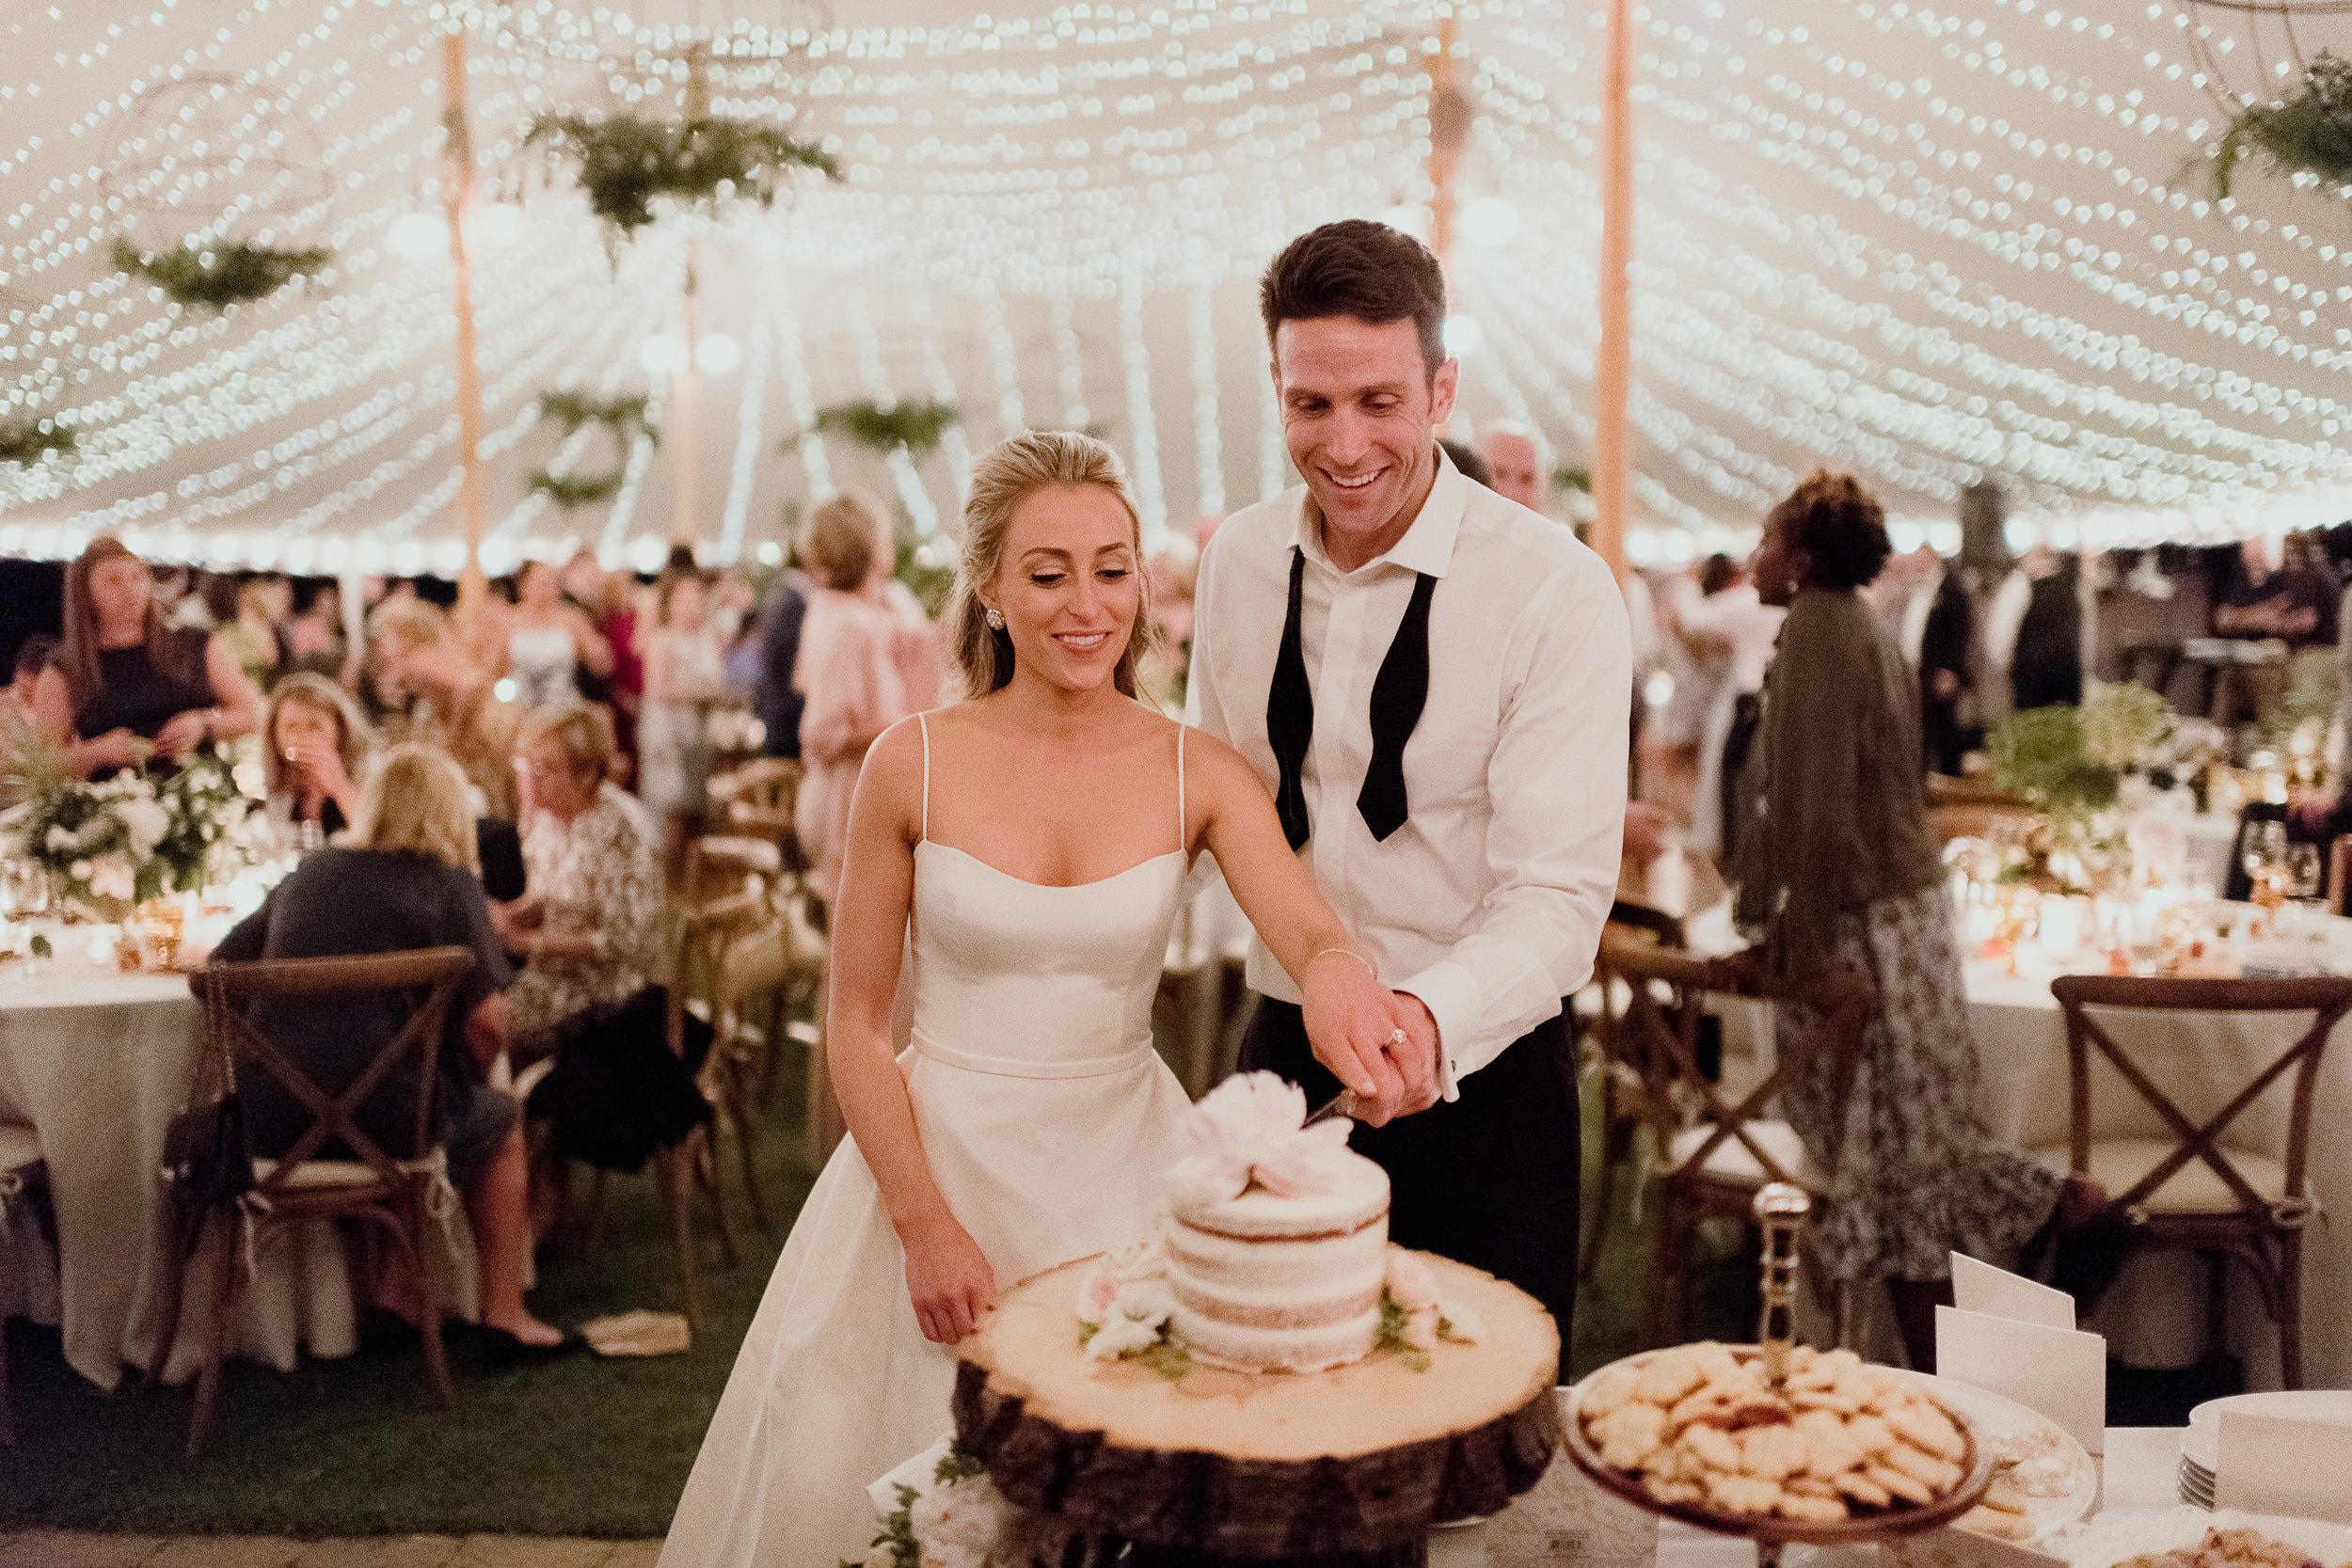 Green & White Wedding Jonathon Edwards Vineyard Wedding0-75.jpg